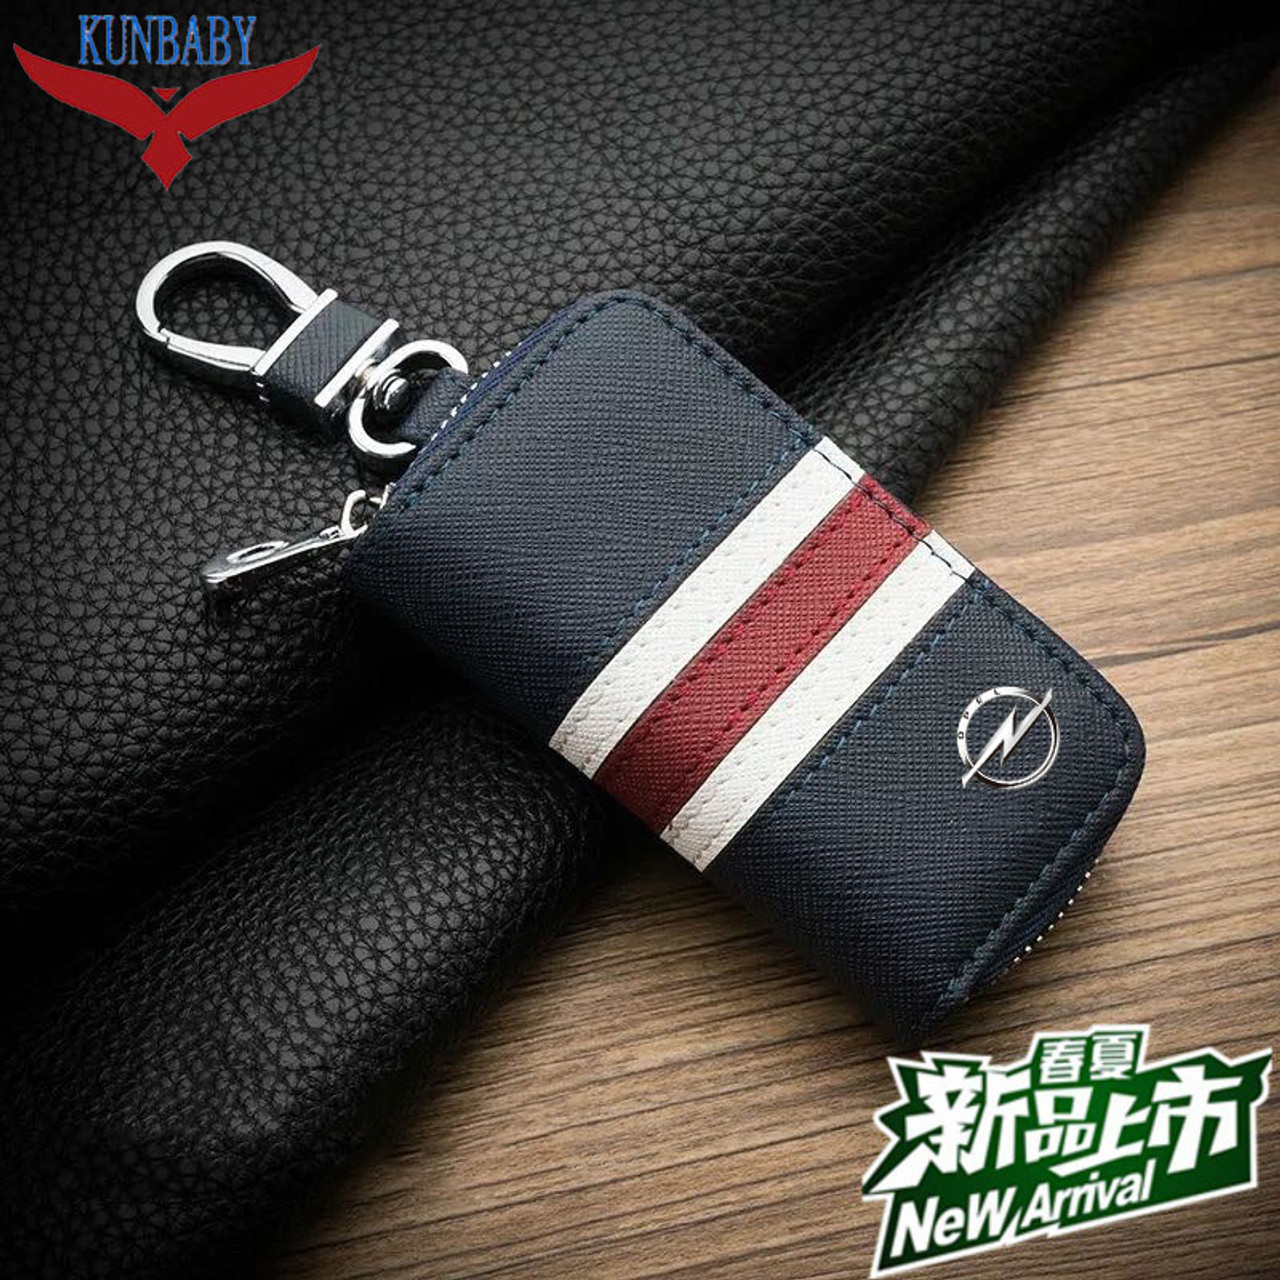 KUNBABY Top Men Women s New Fashion Car Keys Bag Keys Chains Case Holder  Cowhide Leather Key Wallet For Opel - OnshopDeals.Com a52e7cb7d